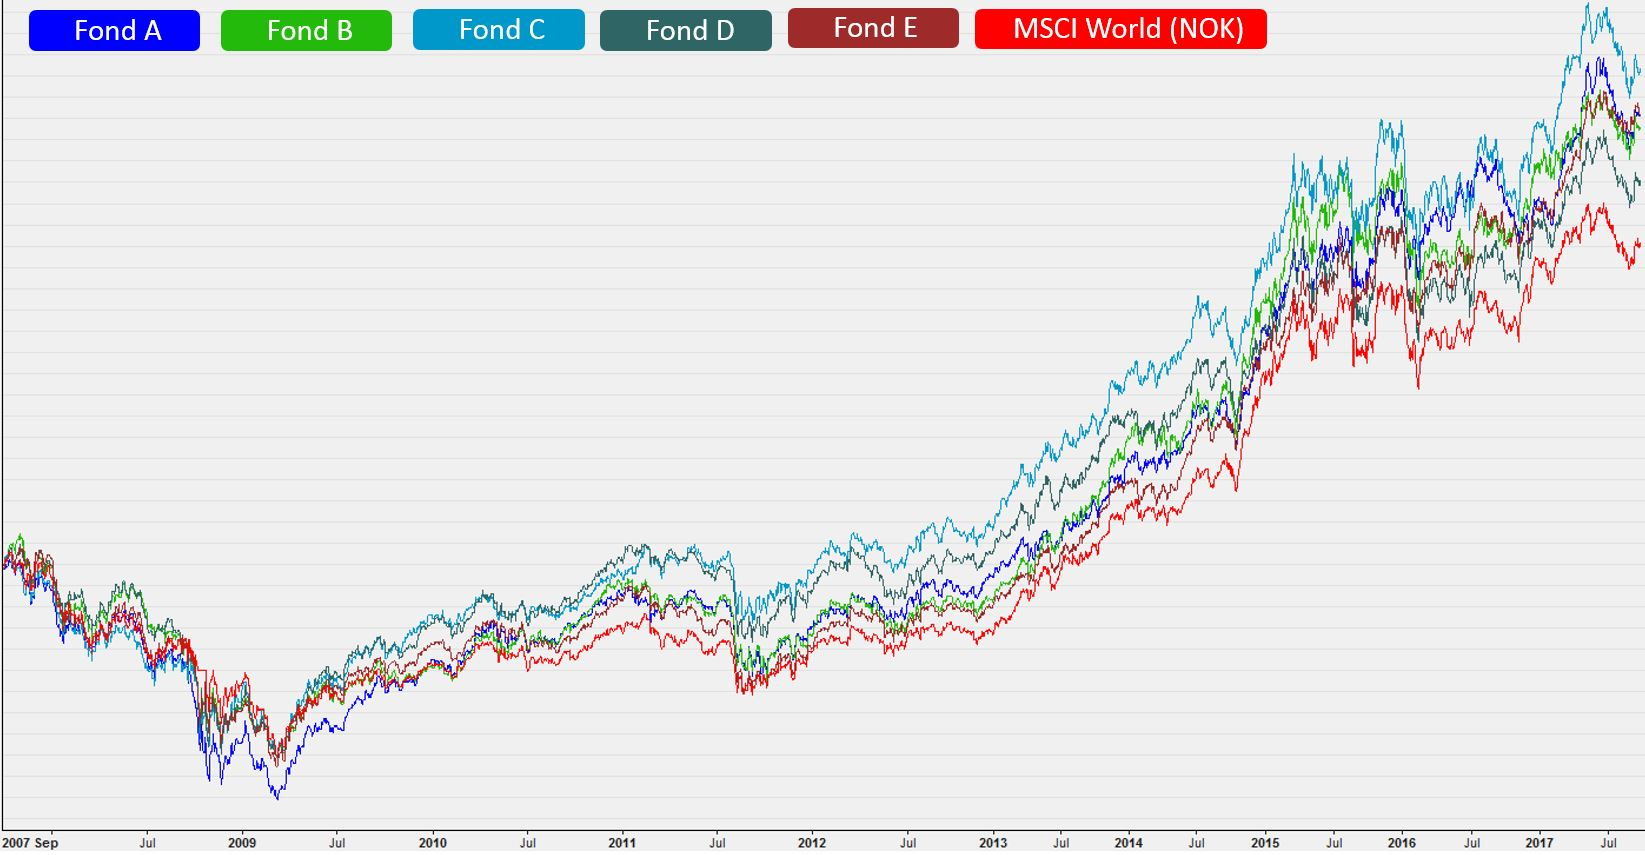 Avkastningen i 5 norske aktiv forvaltede globale aksjefond sammenlignet med verdensindeksen (MSCI World) i norske kroner (NOK) fra september 2007 til 2017.